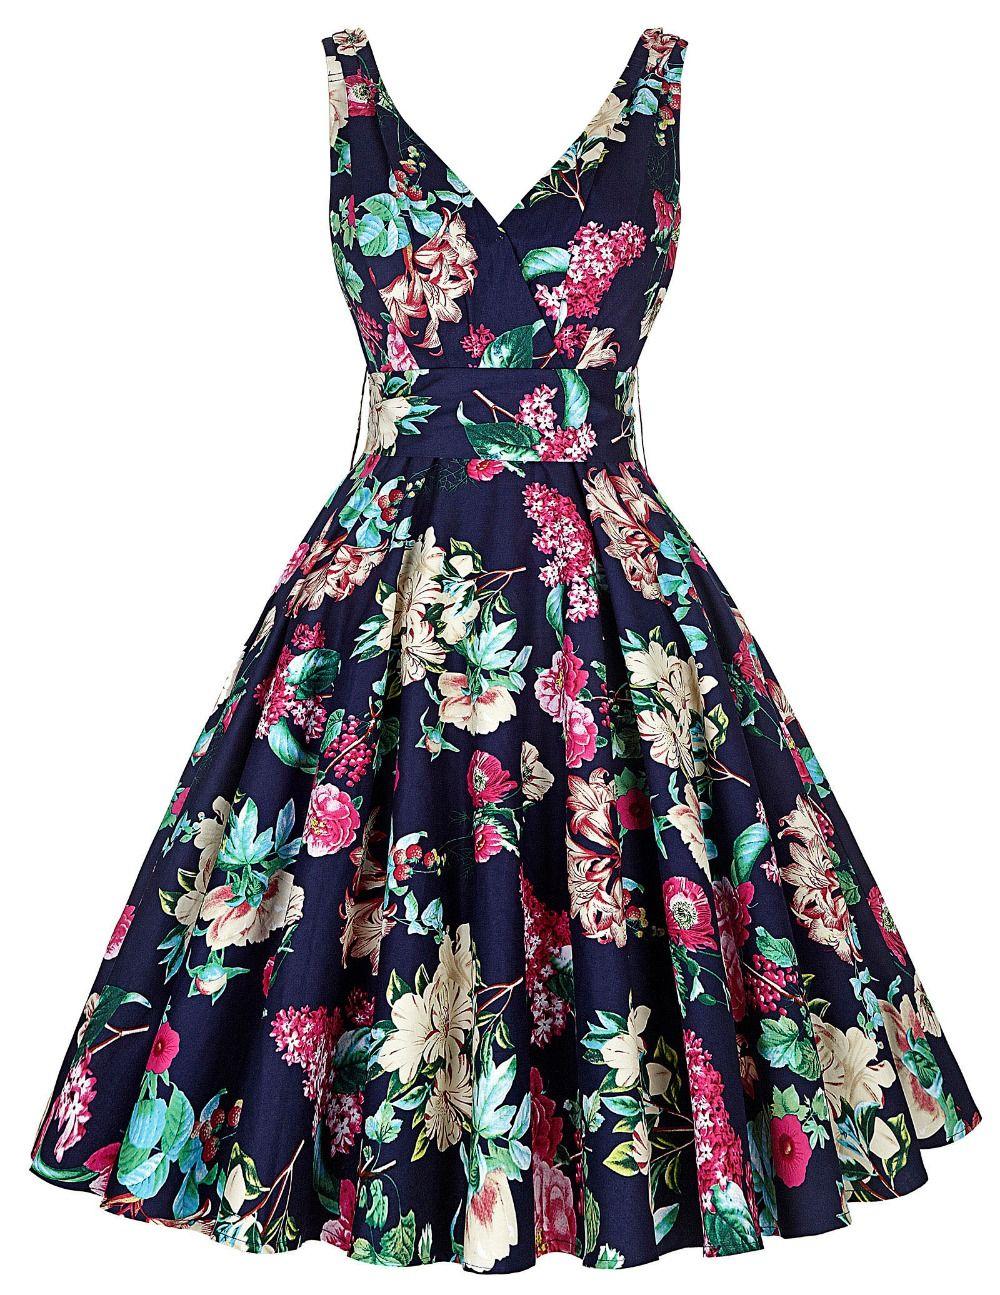 women dress summer style 2016 casual retro vintage 1950s 60s big